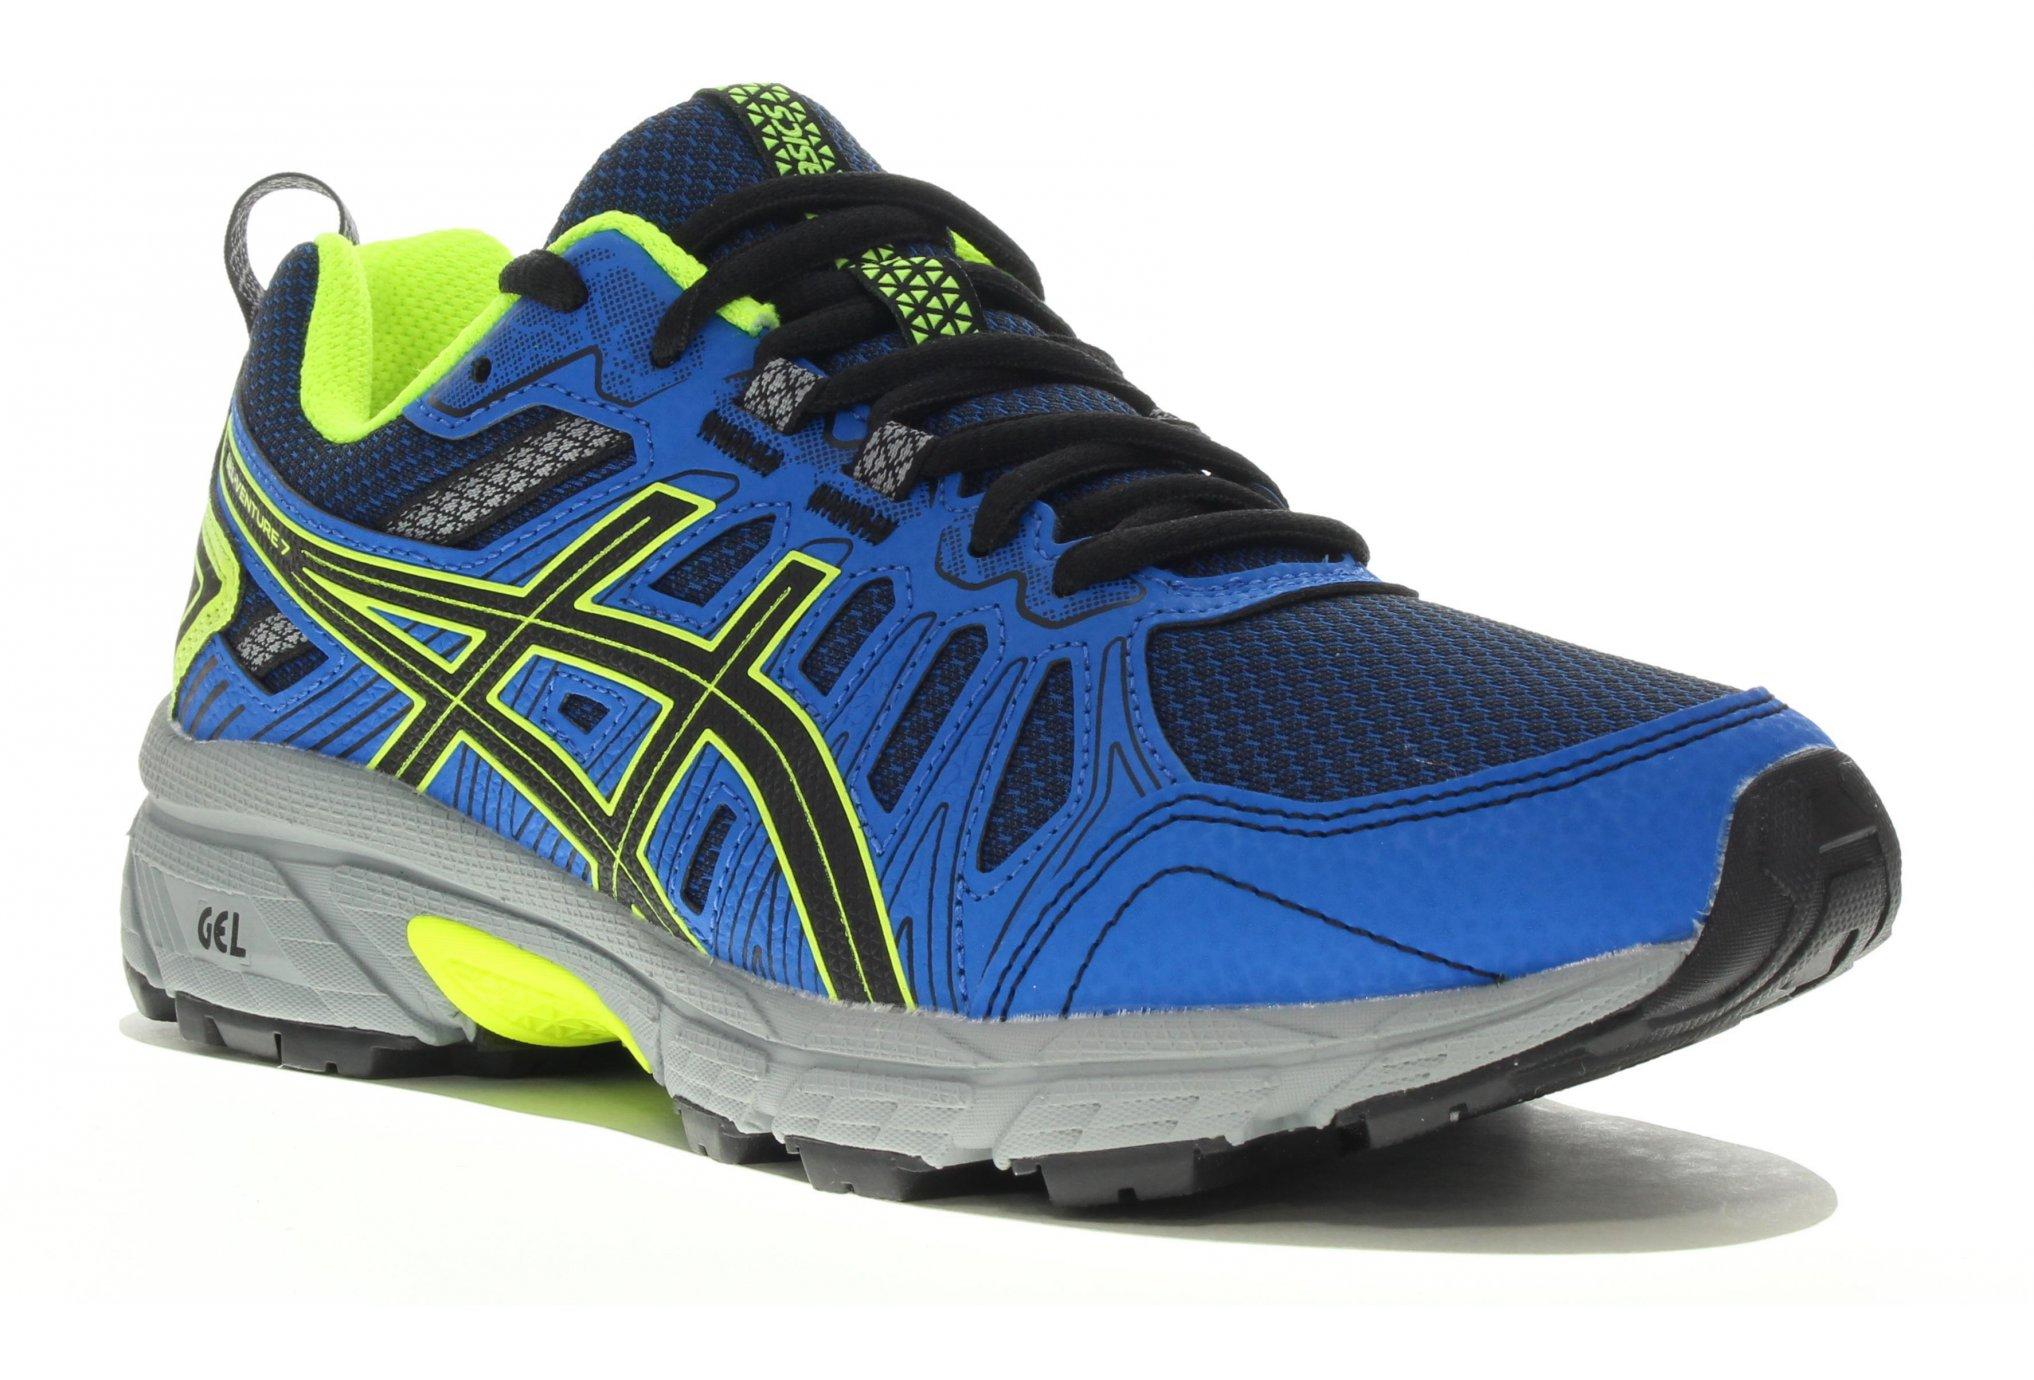 Asics Gel-Venture 7 Chaussures homme